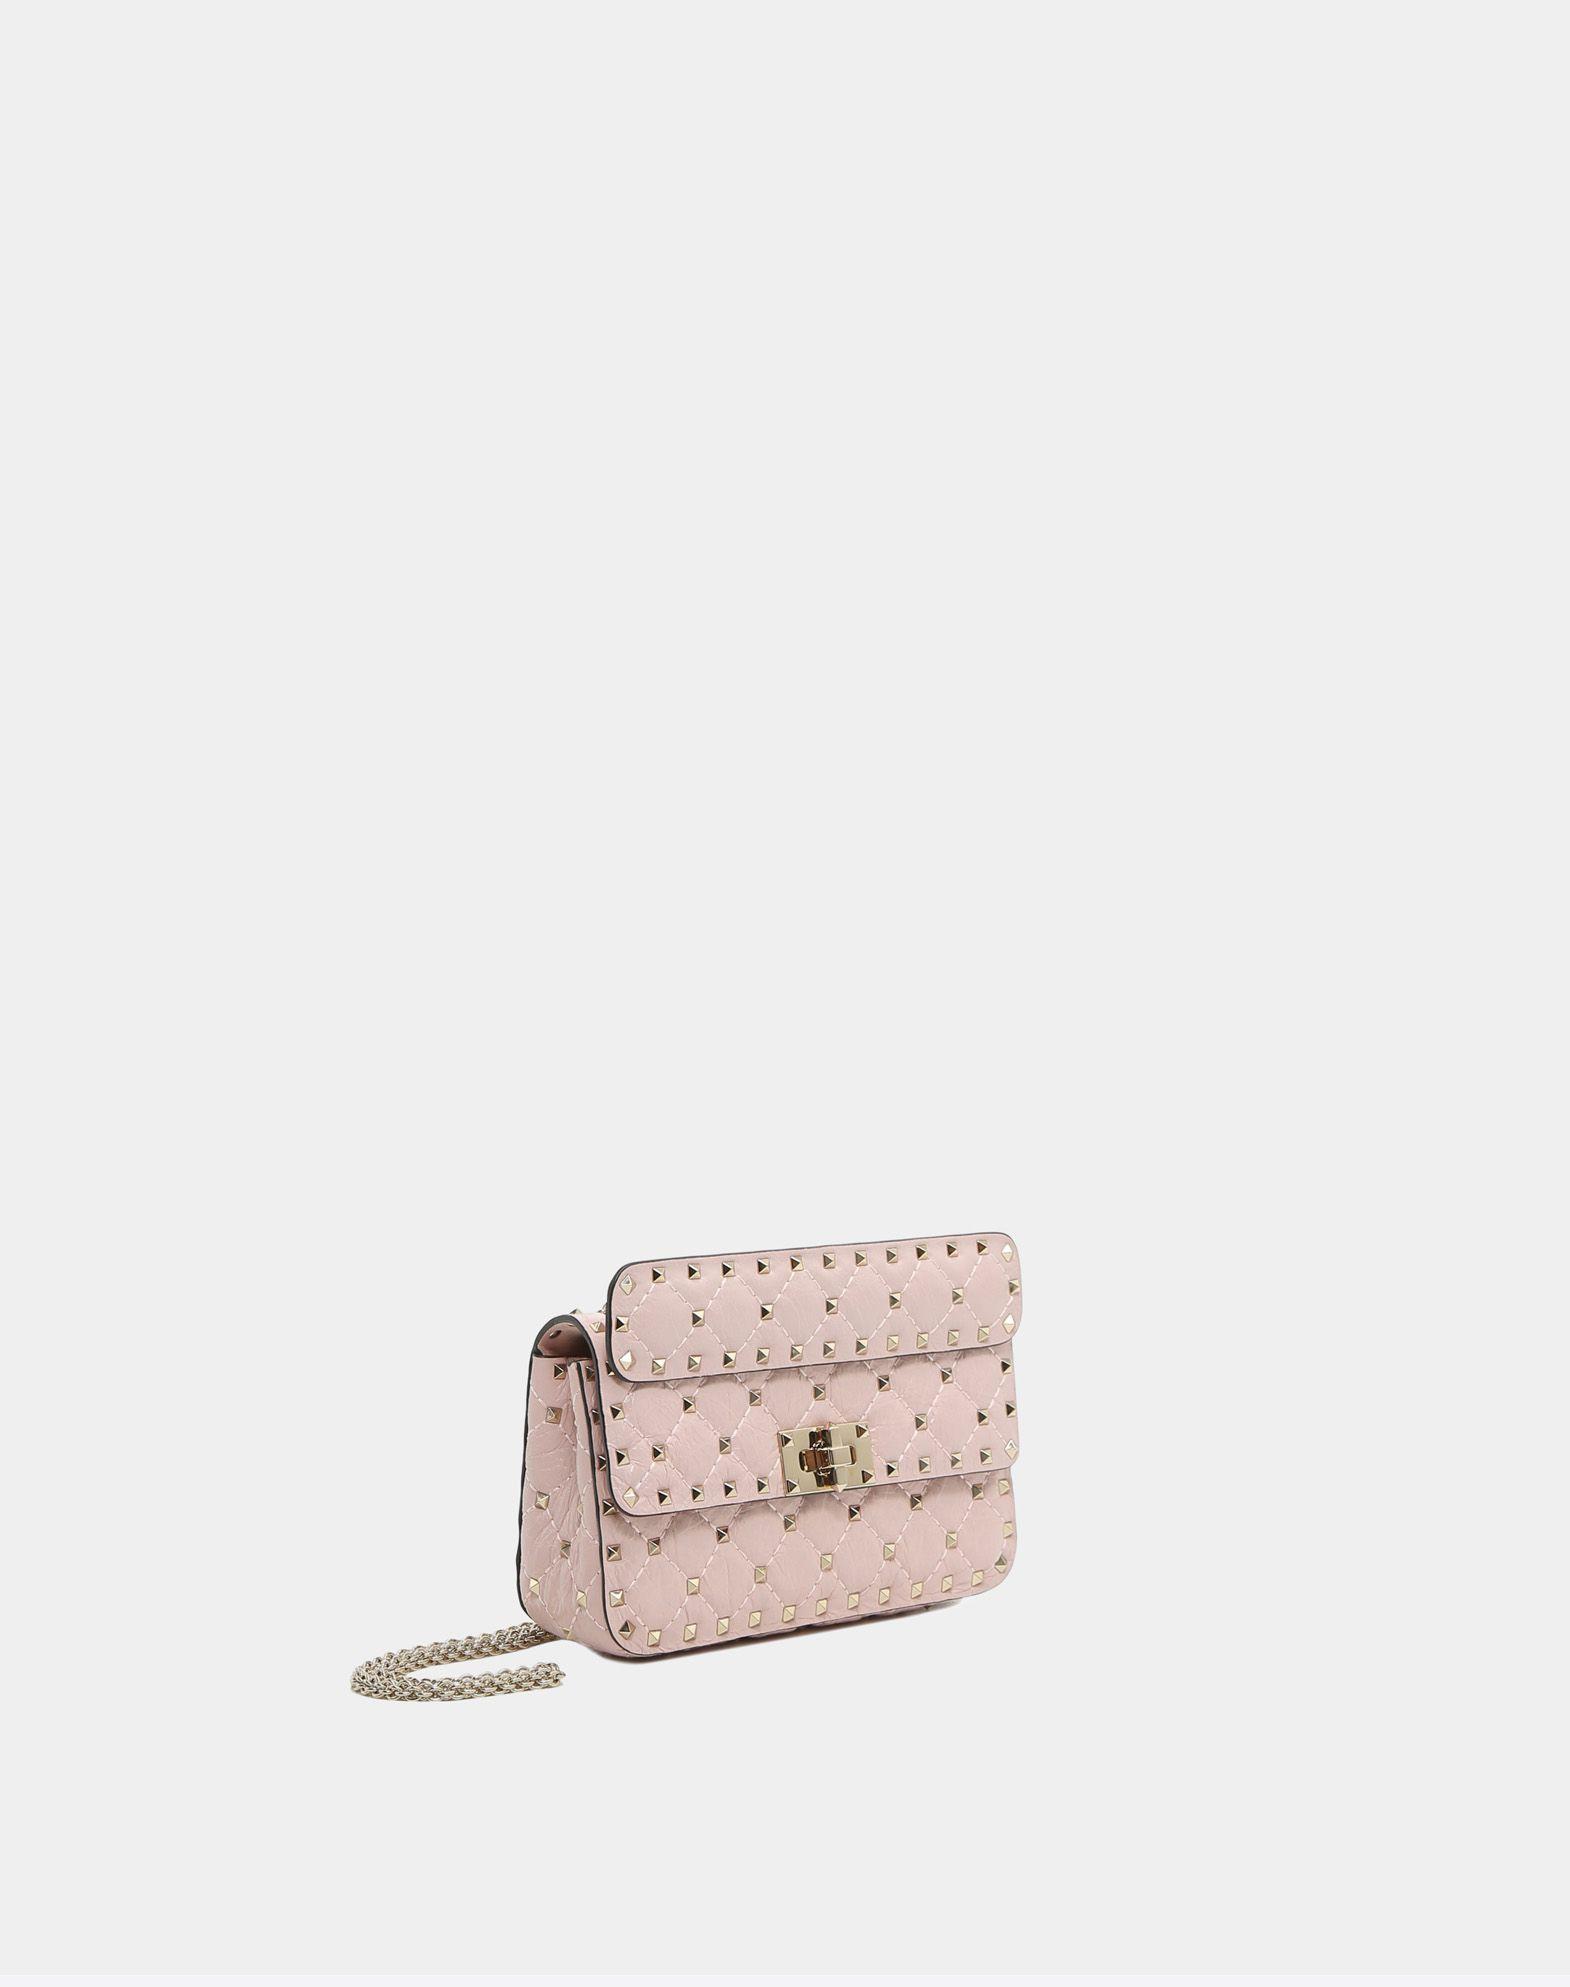 VALENTINO GARAVANI Rockstud Spike Small Chain Bag Shoulder bag D r